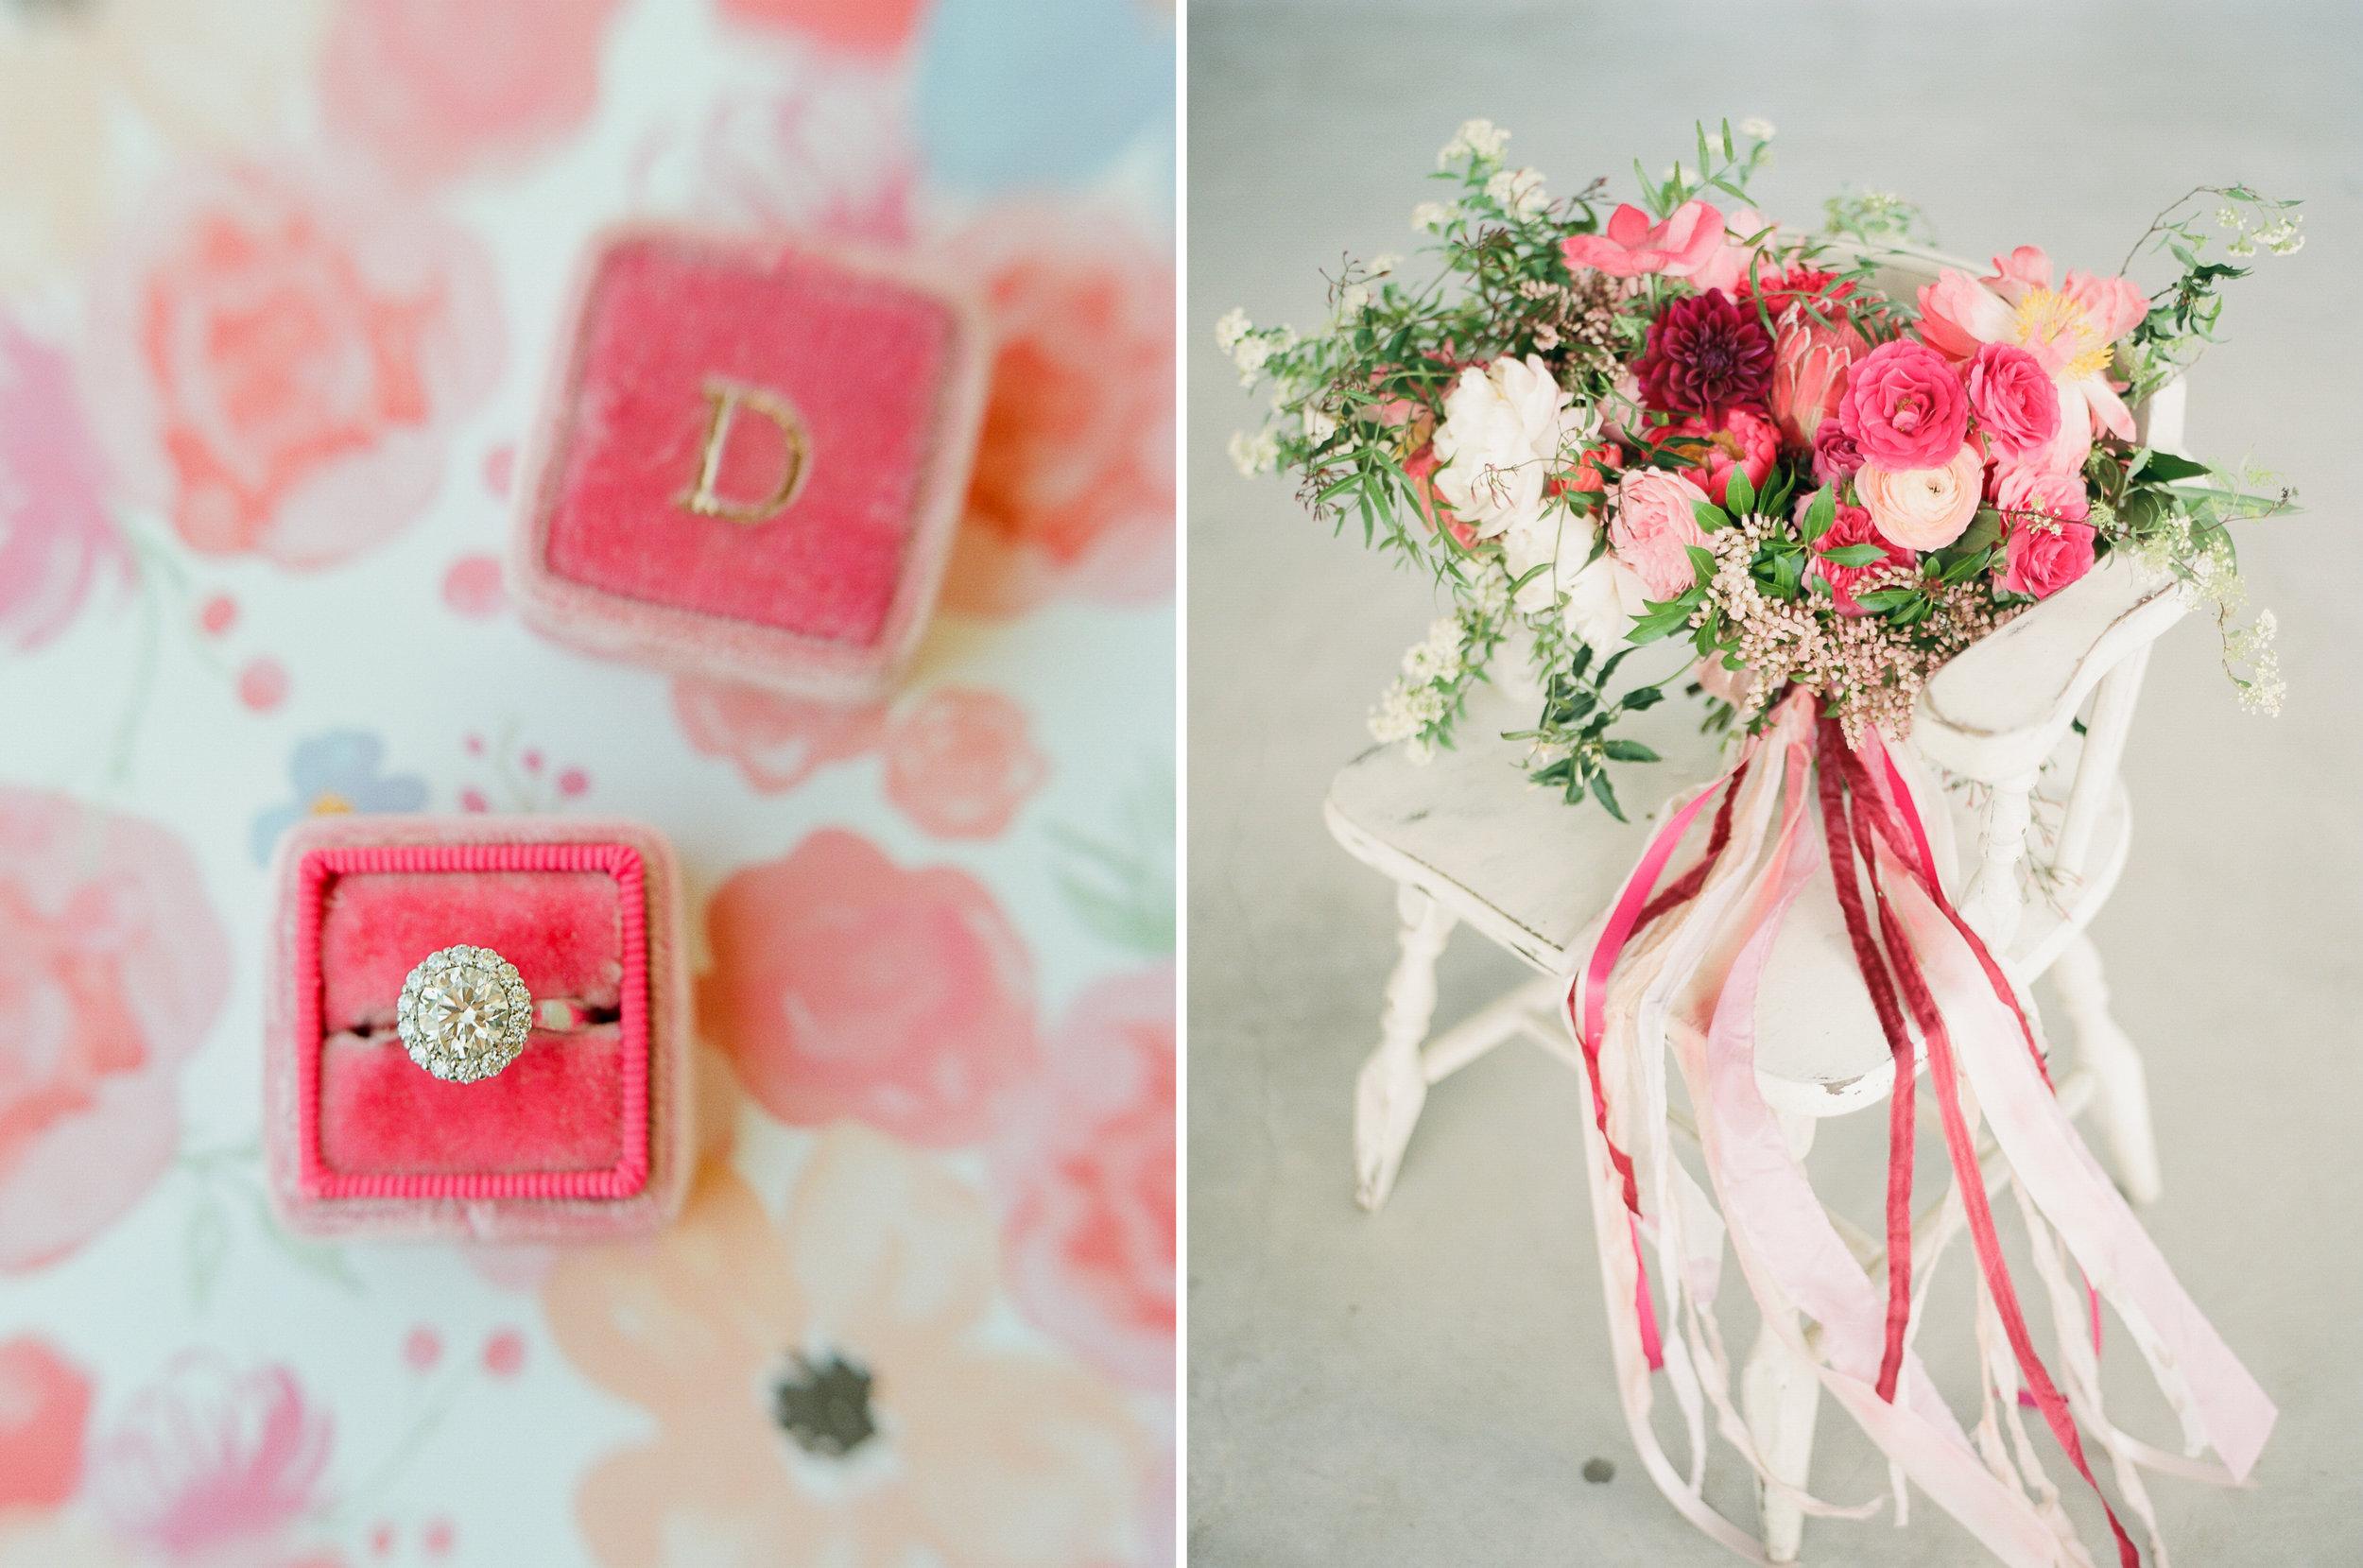 The-Knot-50-Weddings-50-States-Texas-Winner-Dana-Fernandez-photography-houston-wedding-photographer-film-fine-art-destination-102.jpg